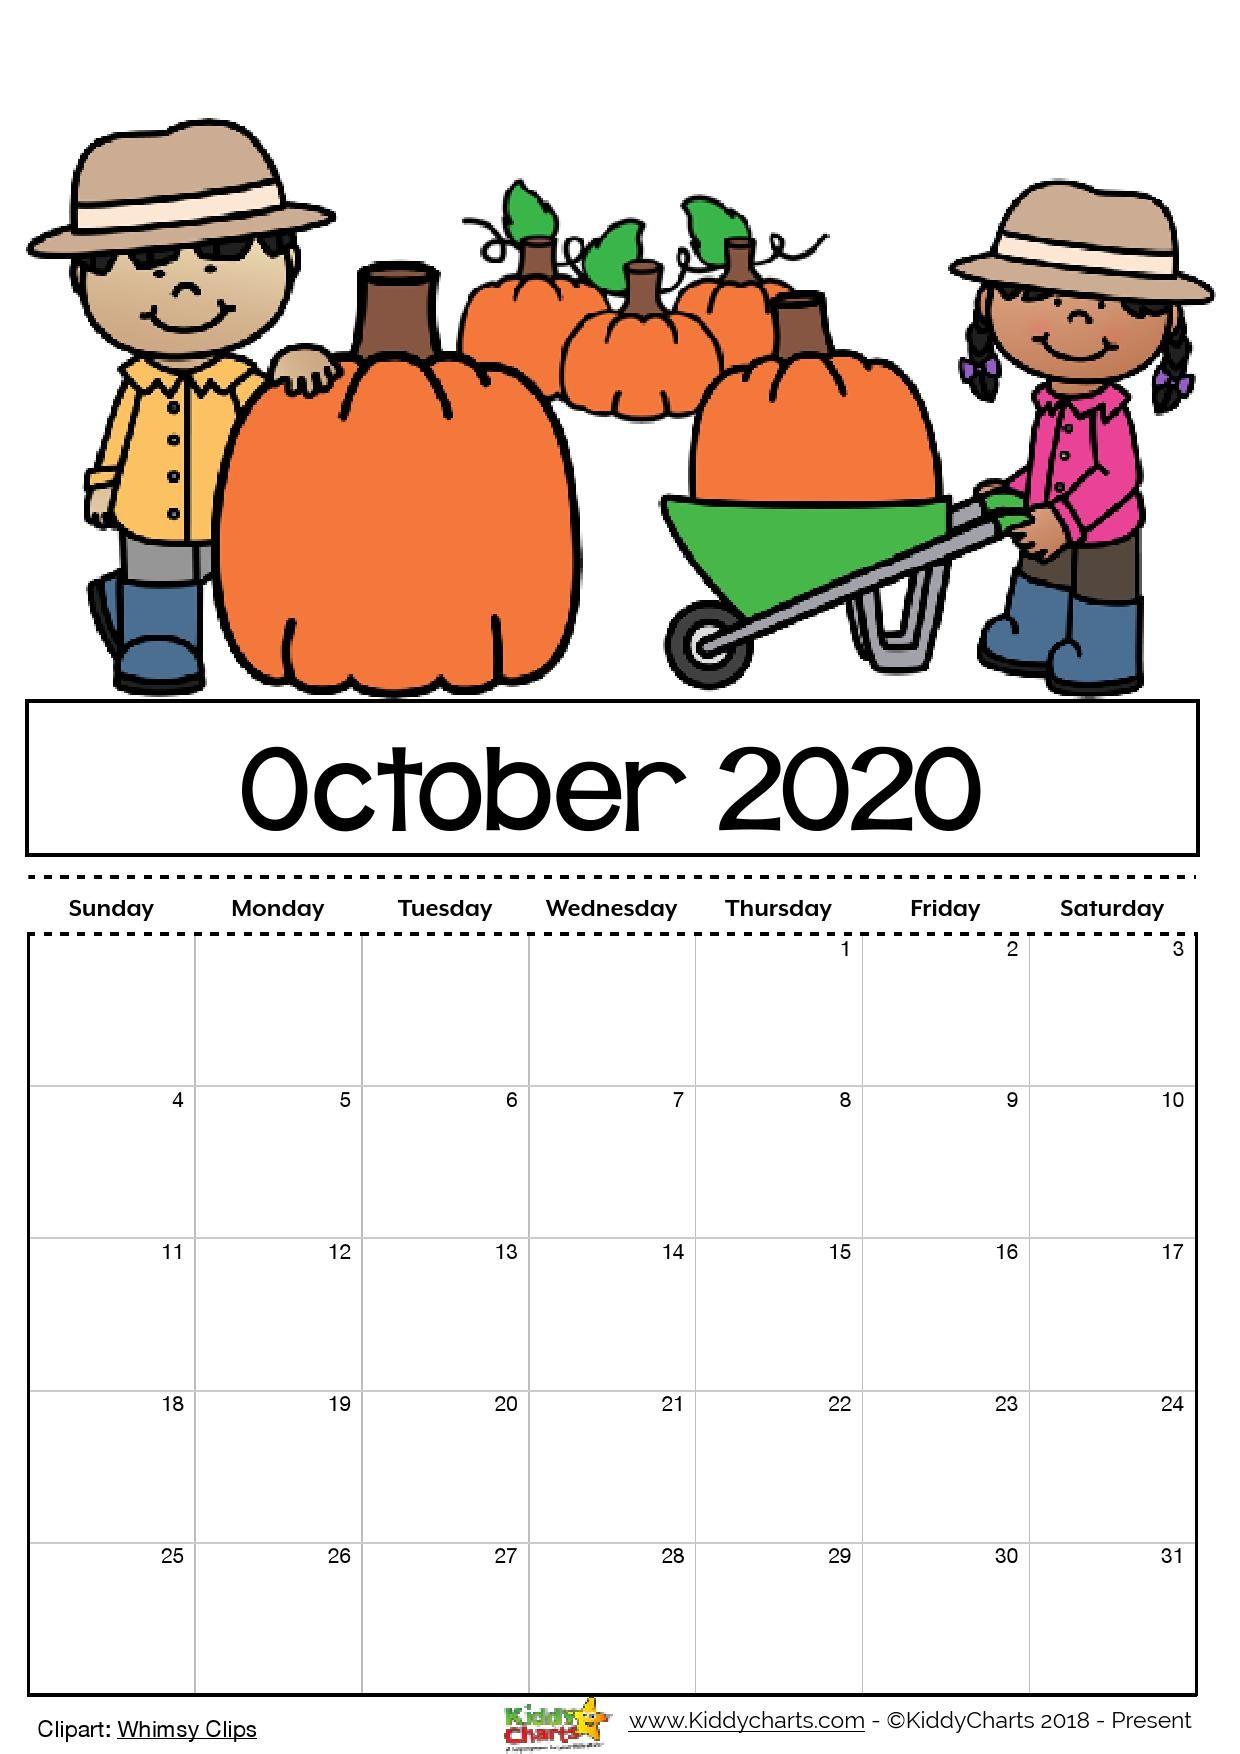 Printable and Editable Calendar Free Printable 2020 Calendar for Kids Including An